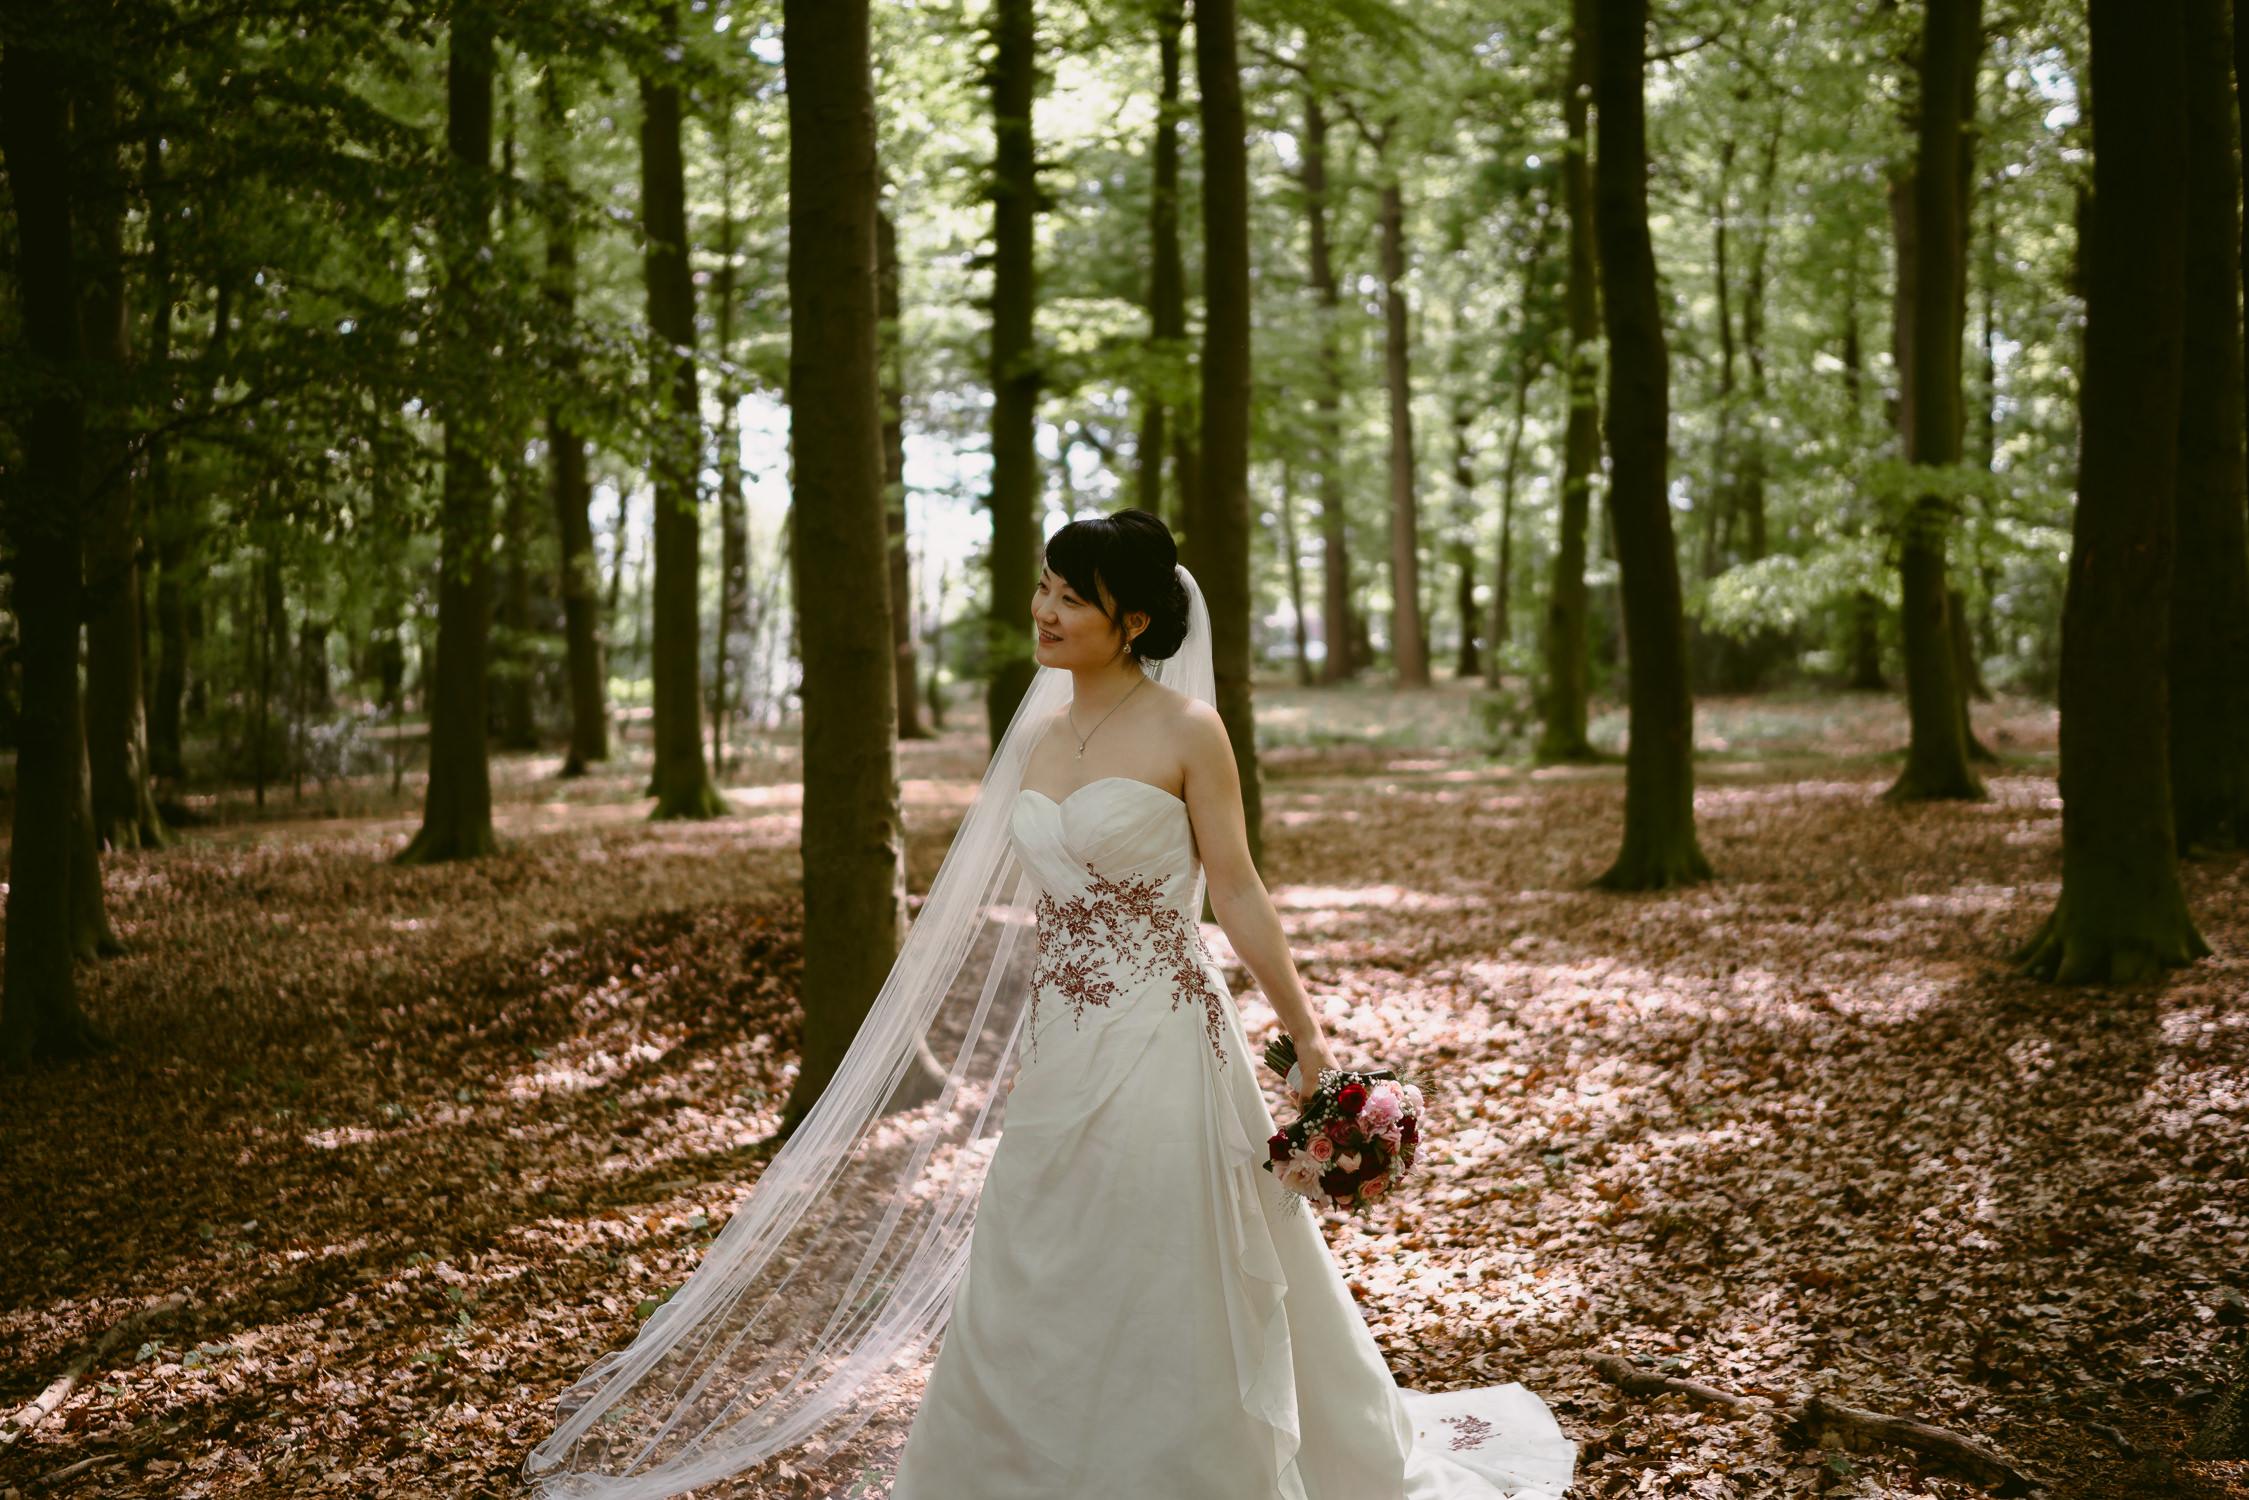 bruidsfotografie-amsterdam-utrecht-trouwfotograaf-mark-hadden-wedding-photography-Yun & Geert-074.jpg